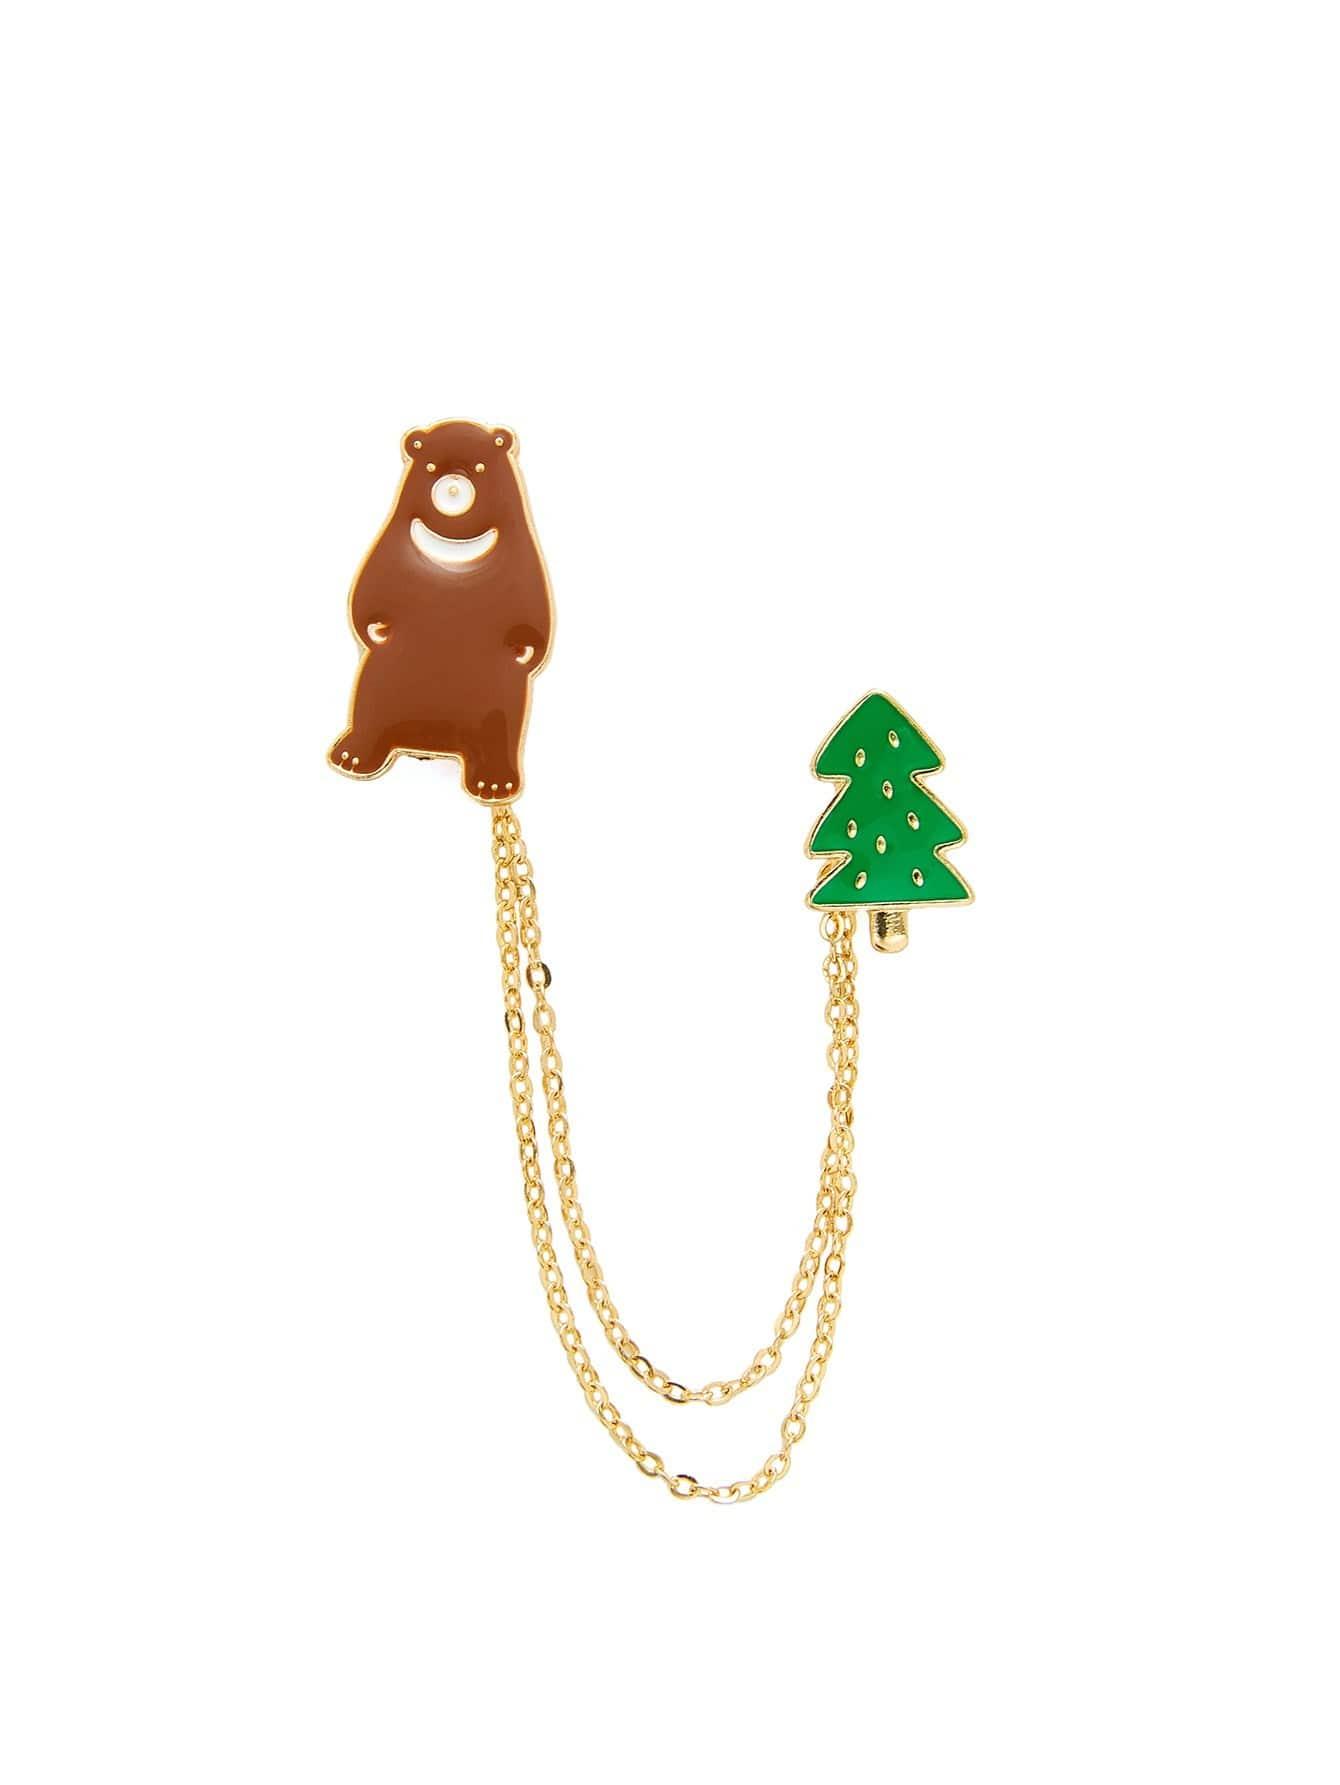 Bear & Tree Design Chain Brooch